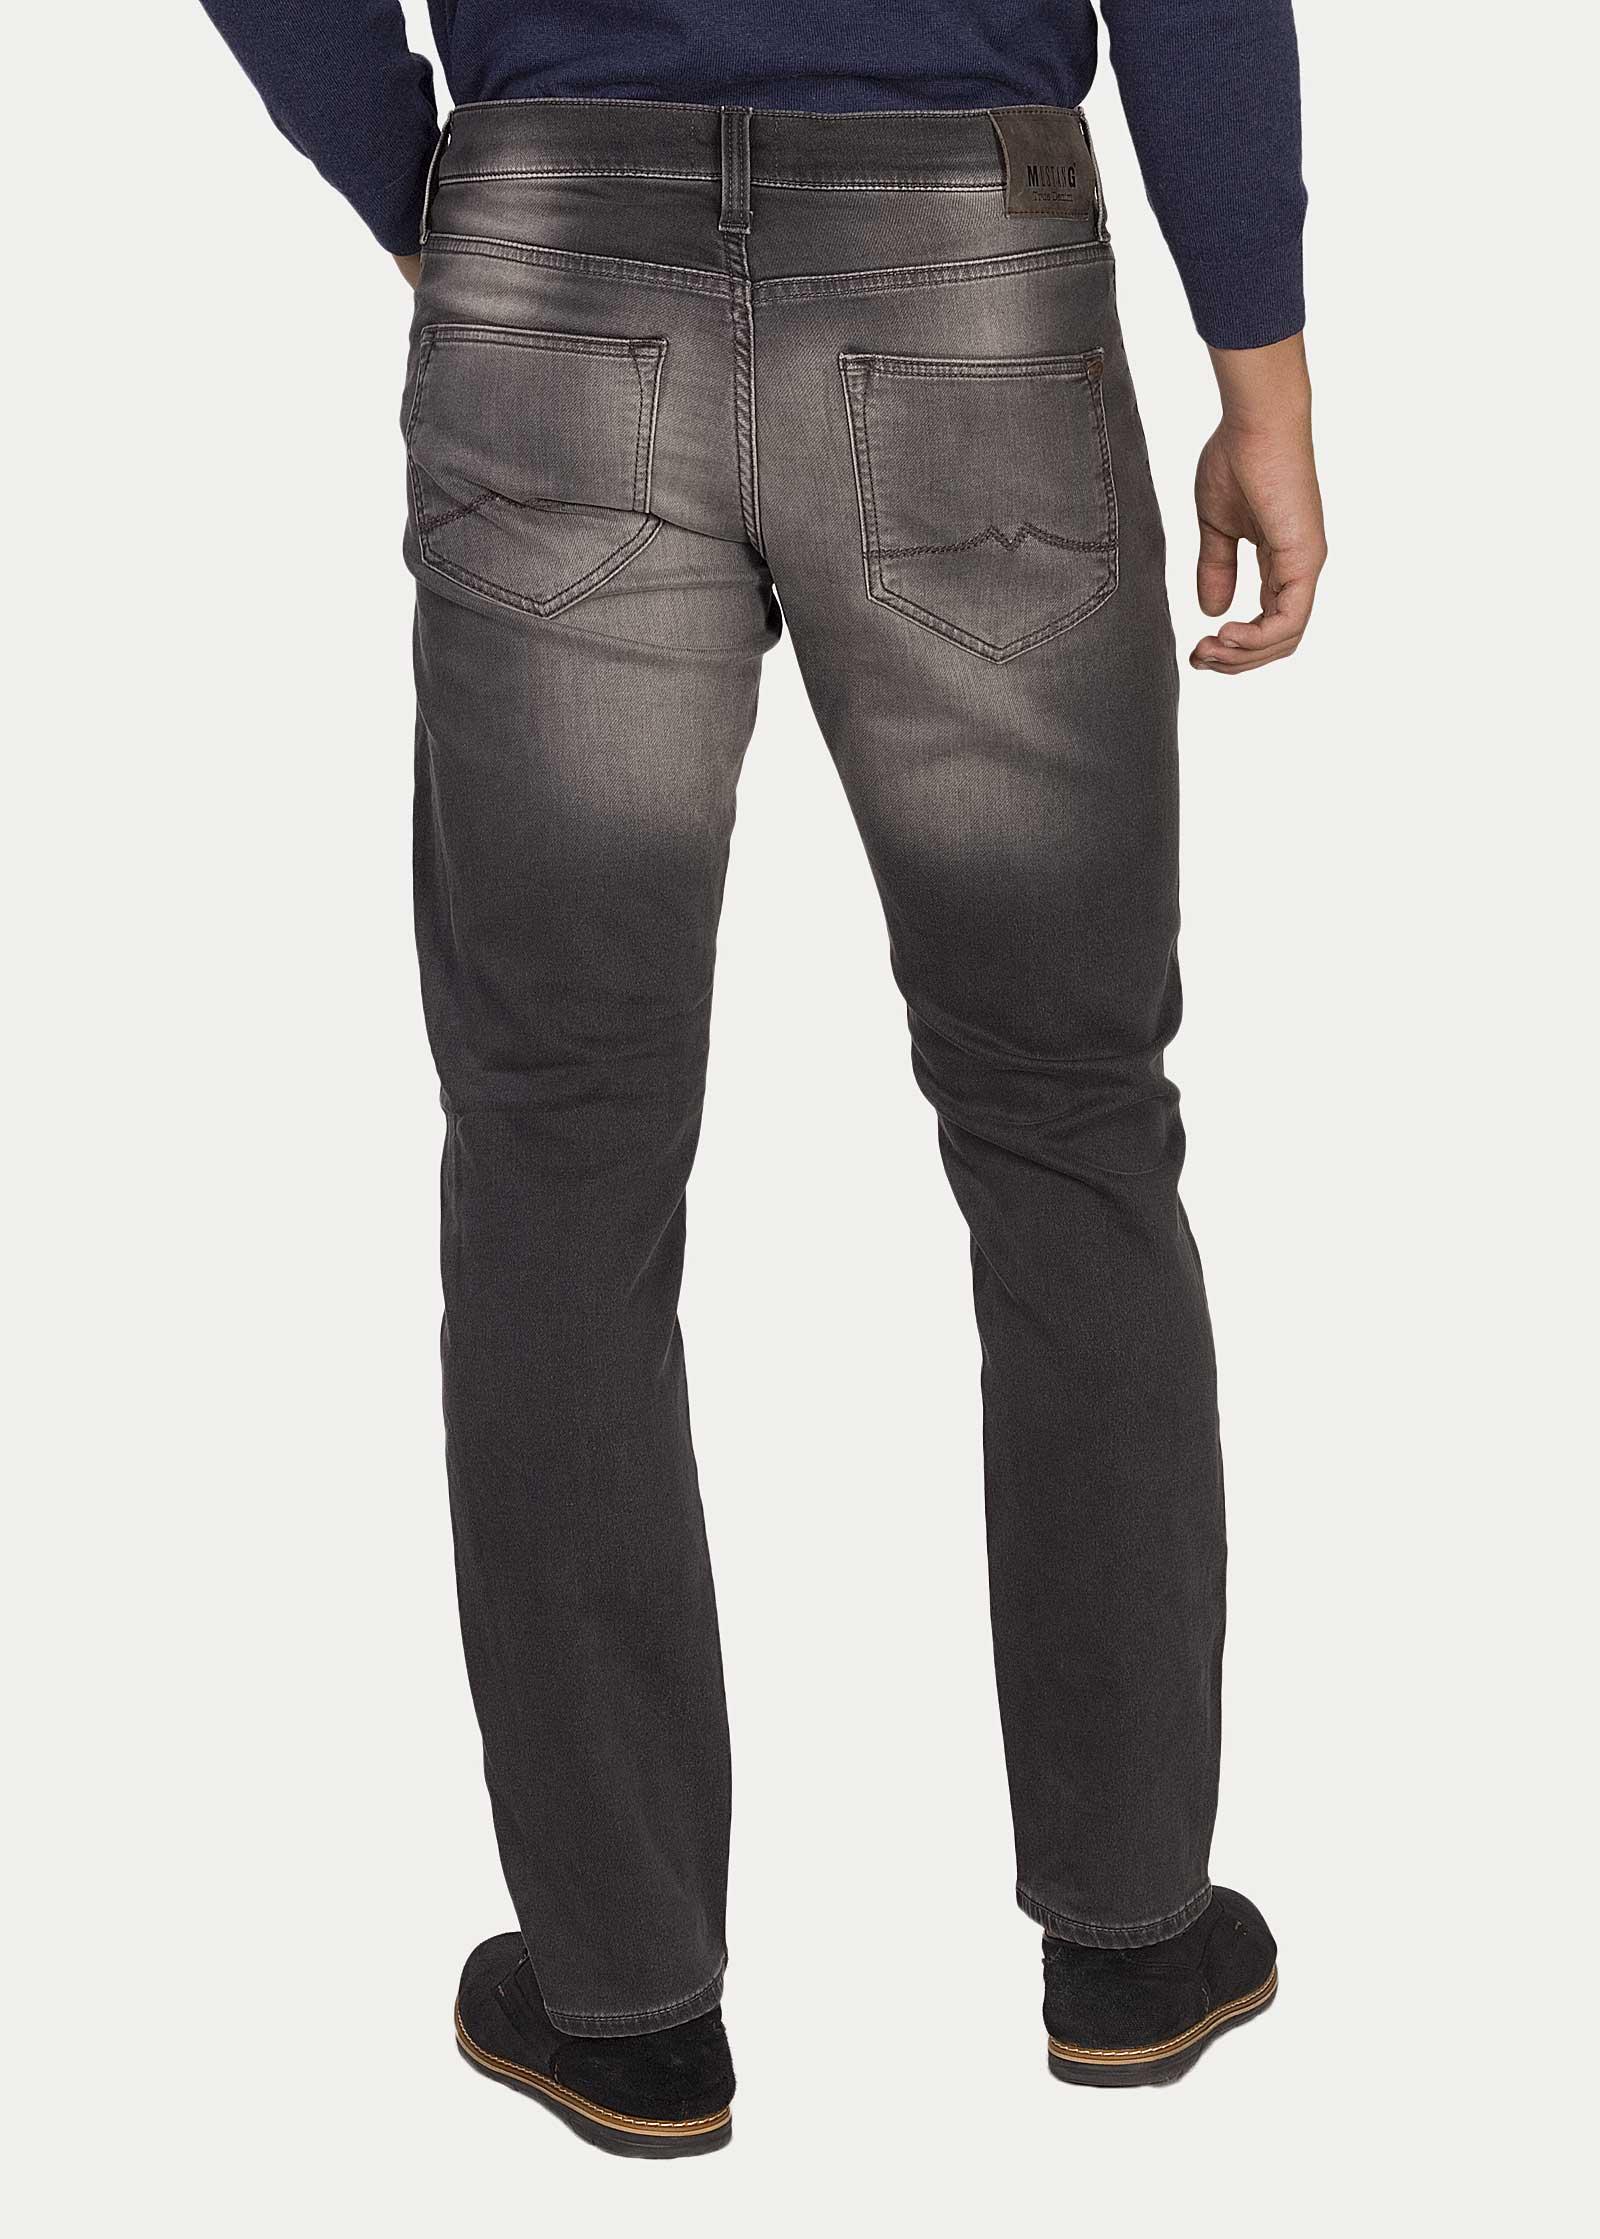 m skie spodnie mustang oregon tapered k 883 medium bleach 1006793 4000 883. Black Bedroom Furniture Sets. Home Design Ideas